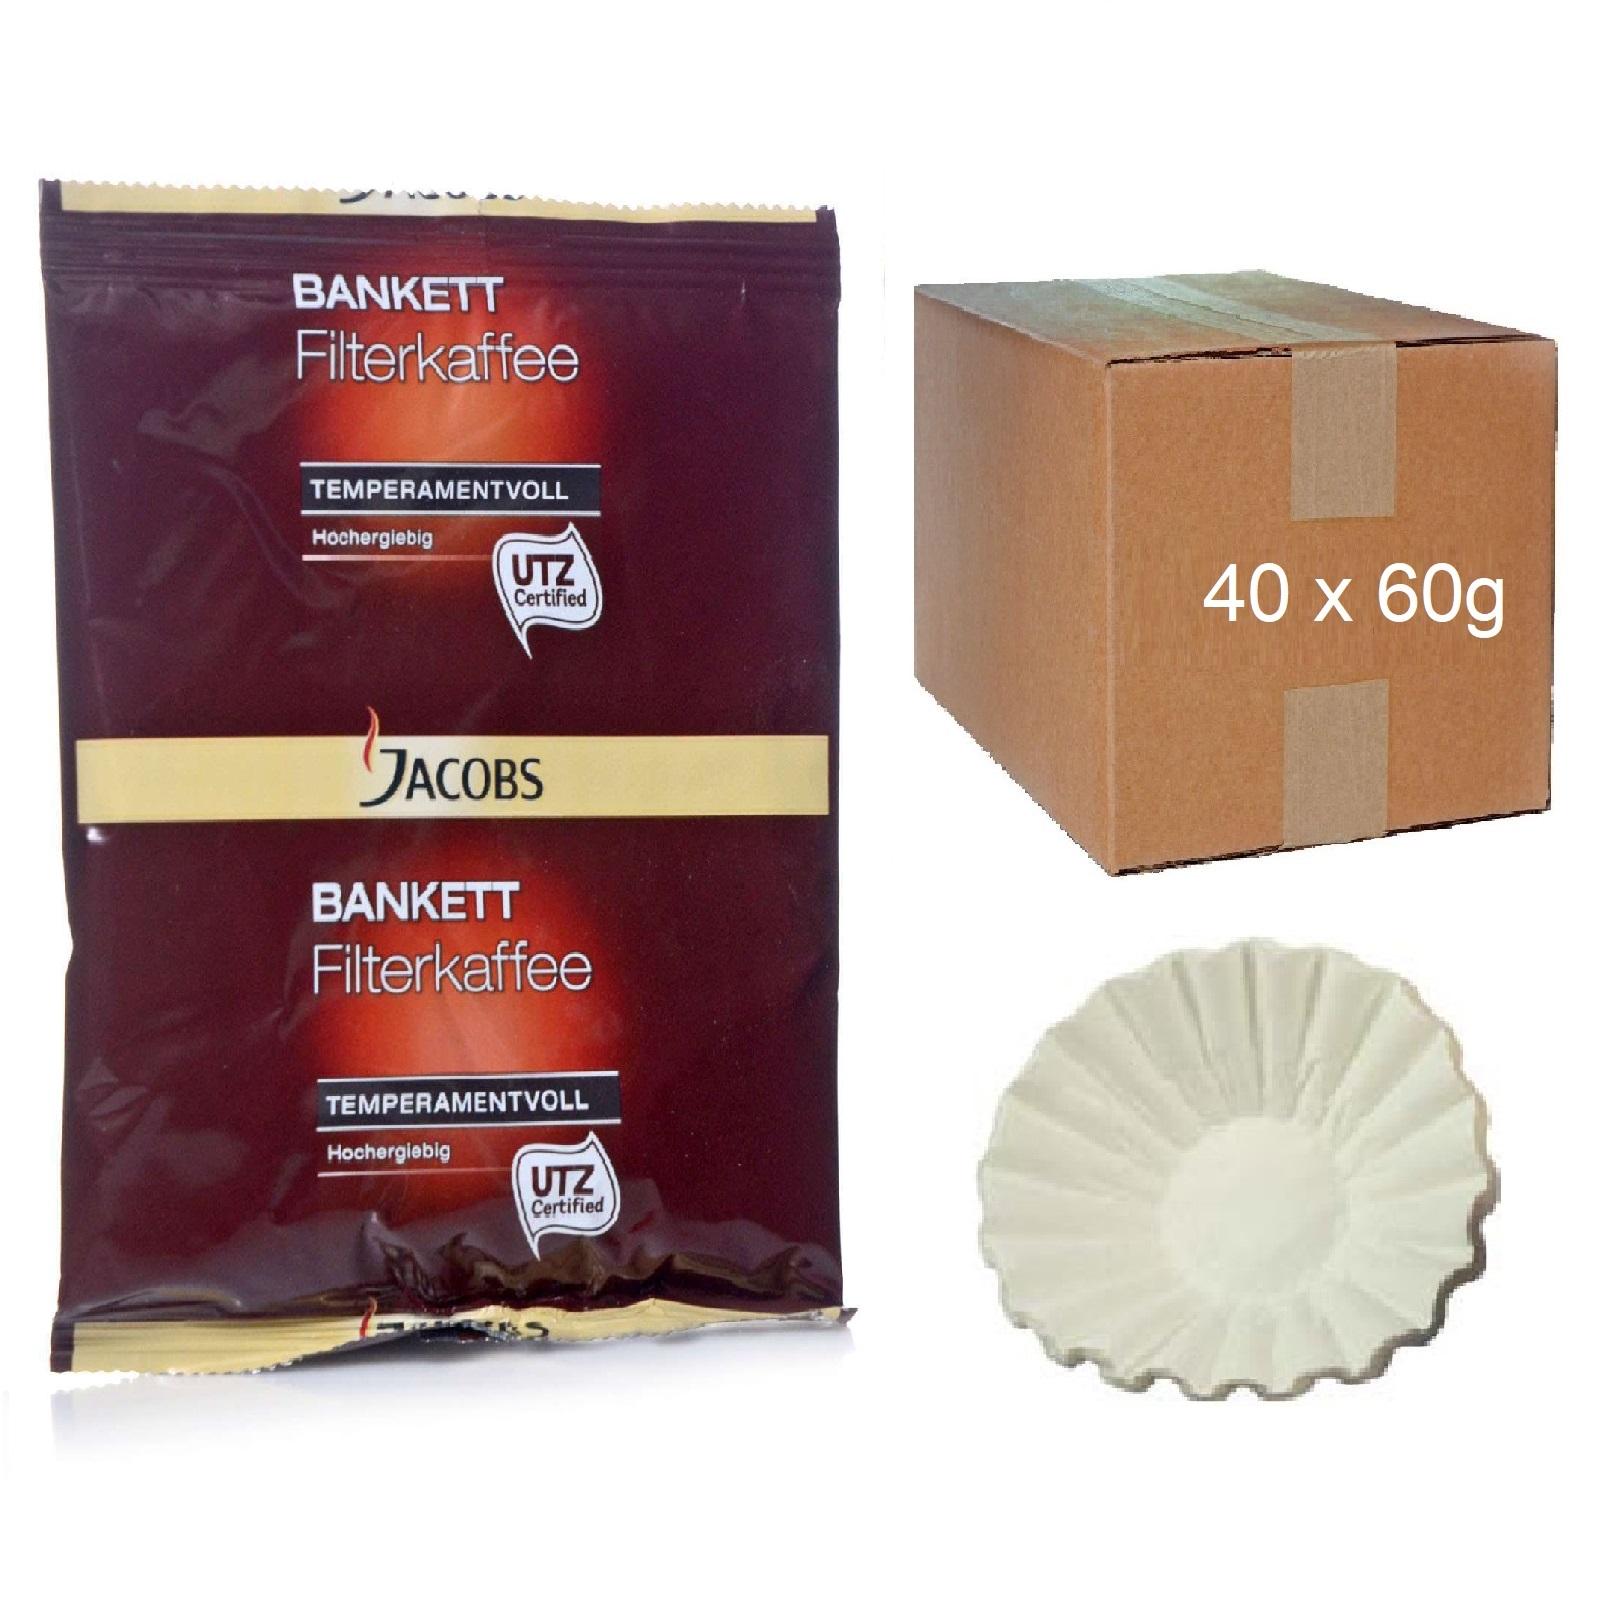 Jacobs Bankett Temperamentvoll 40 x 60g Kaffee Servicepaket inkl. 50 Korbfilter